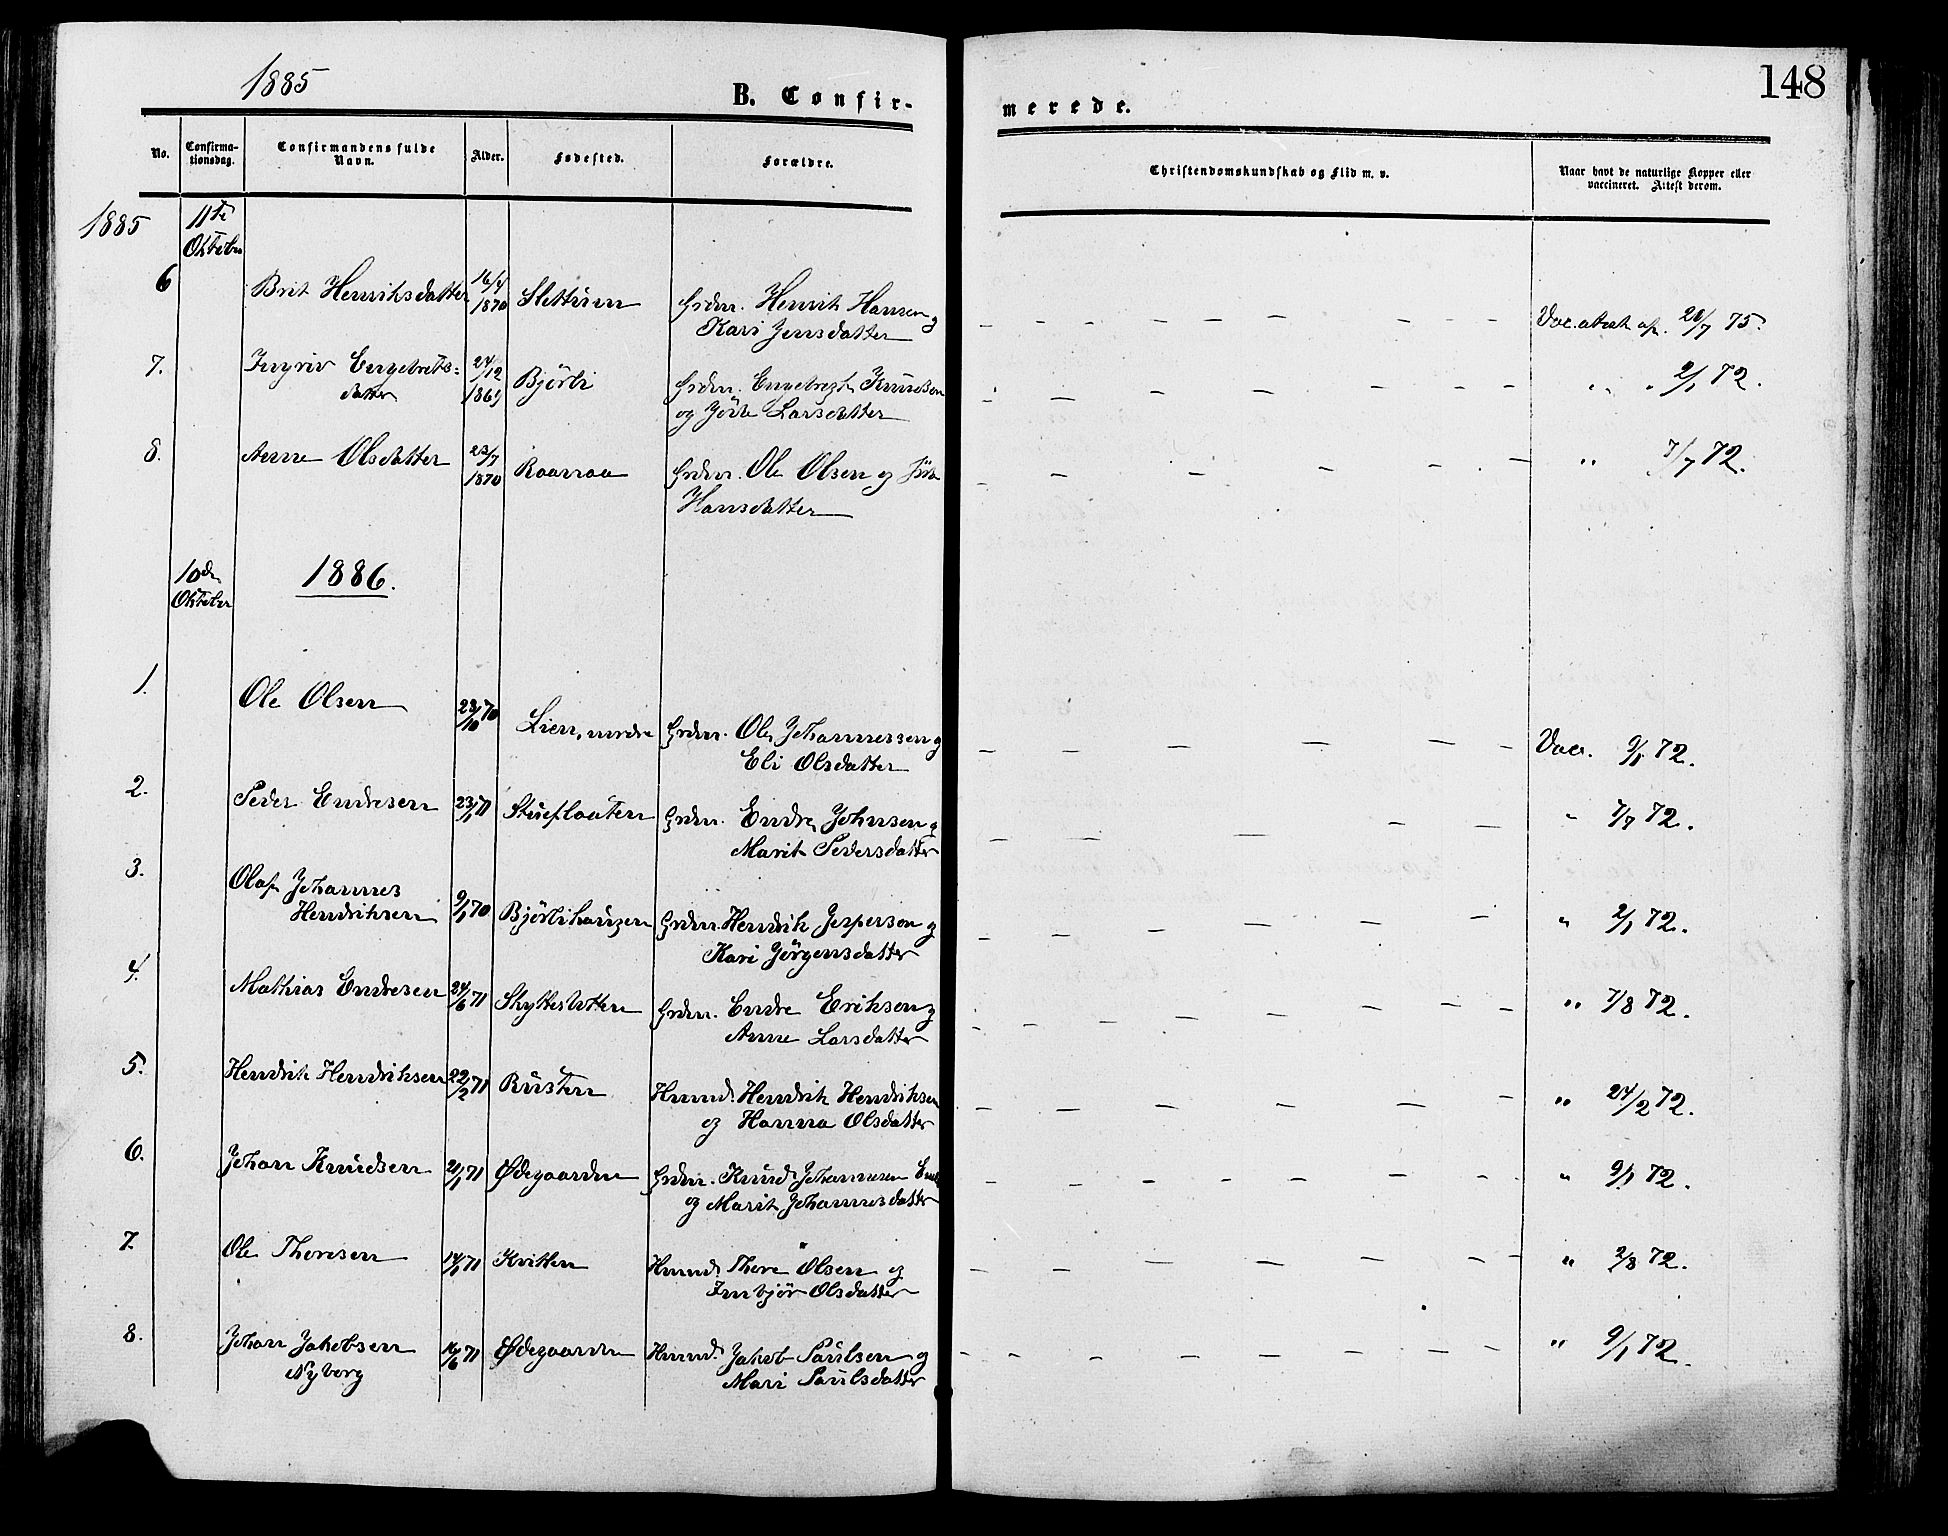 SAH, Lesja prestekontor, Ministerialbok nr. 9, 1854-1889, s. 148